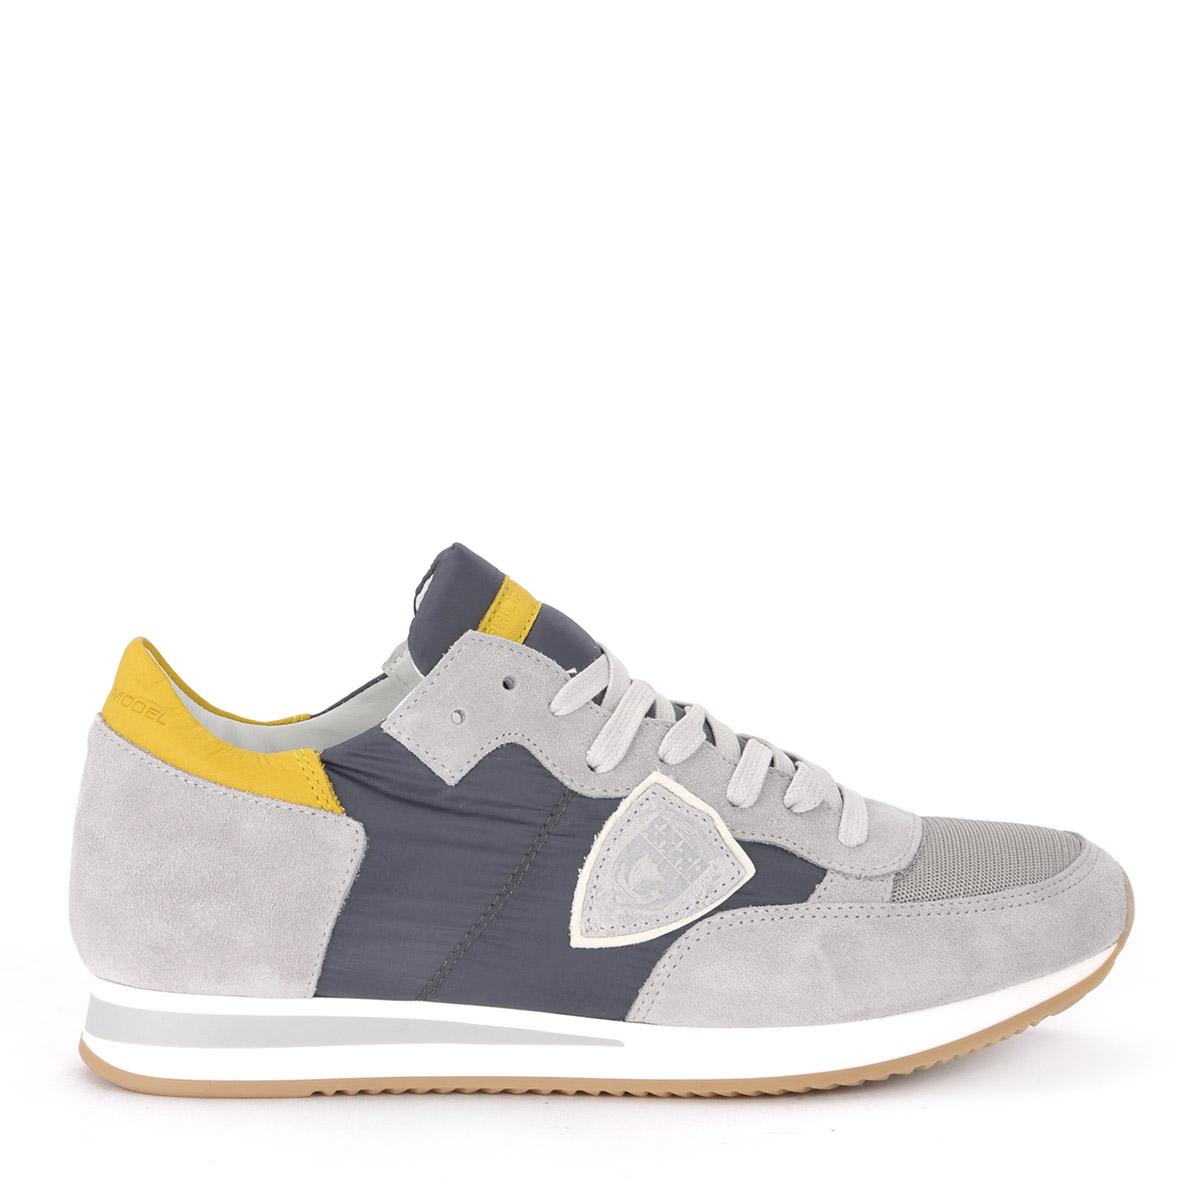 zapatillas Philippe model tropez in Suede and Nylon Dark gris and amarillo or